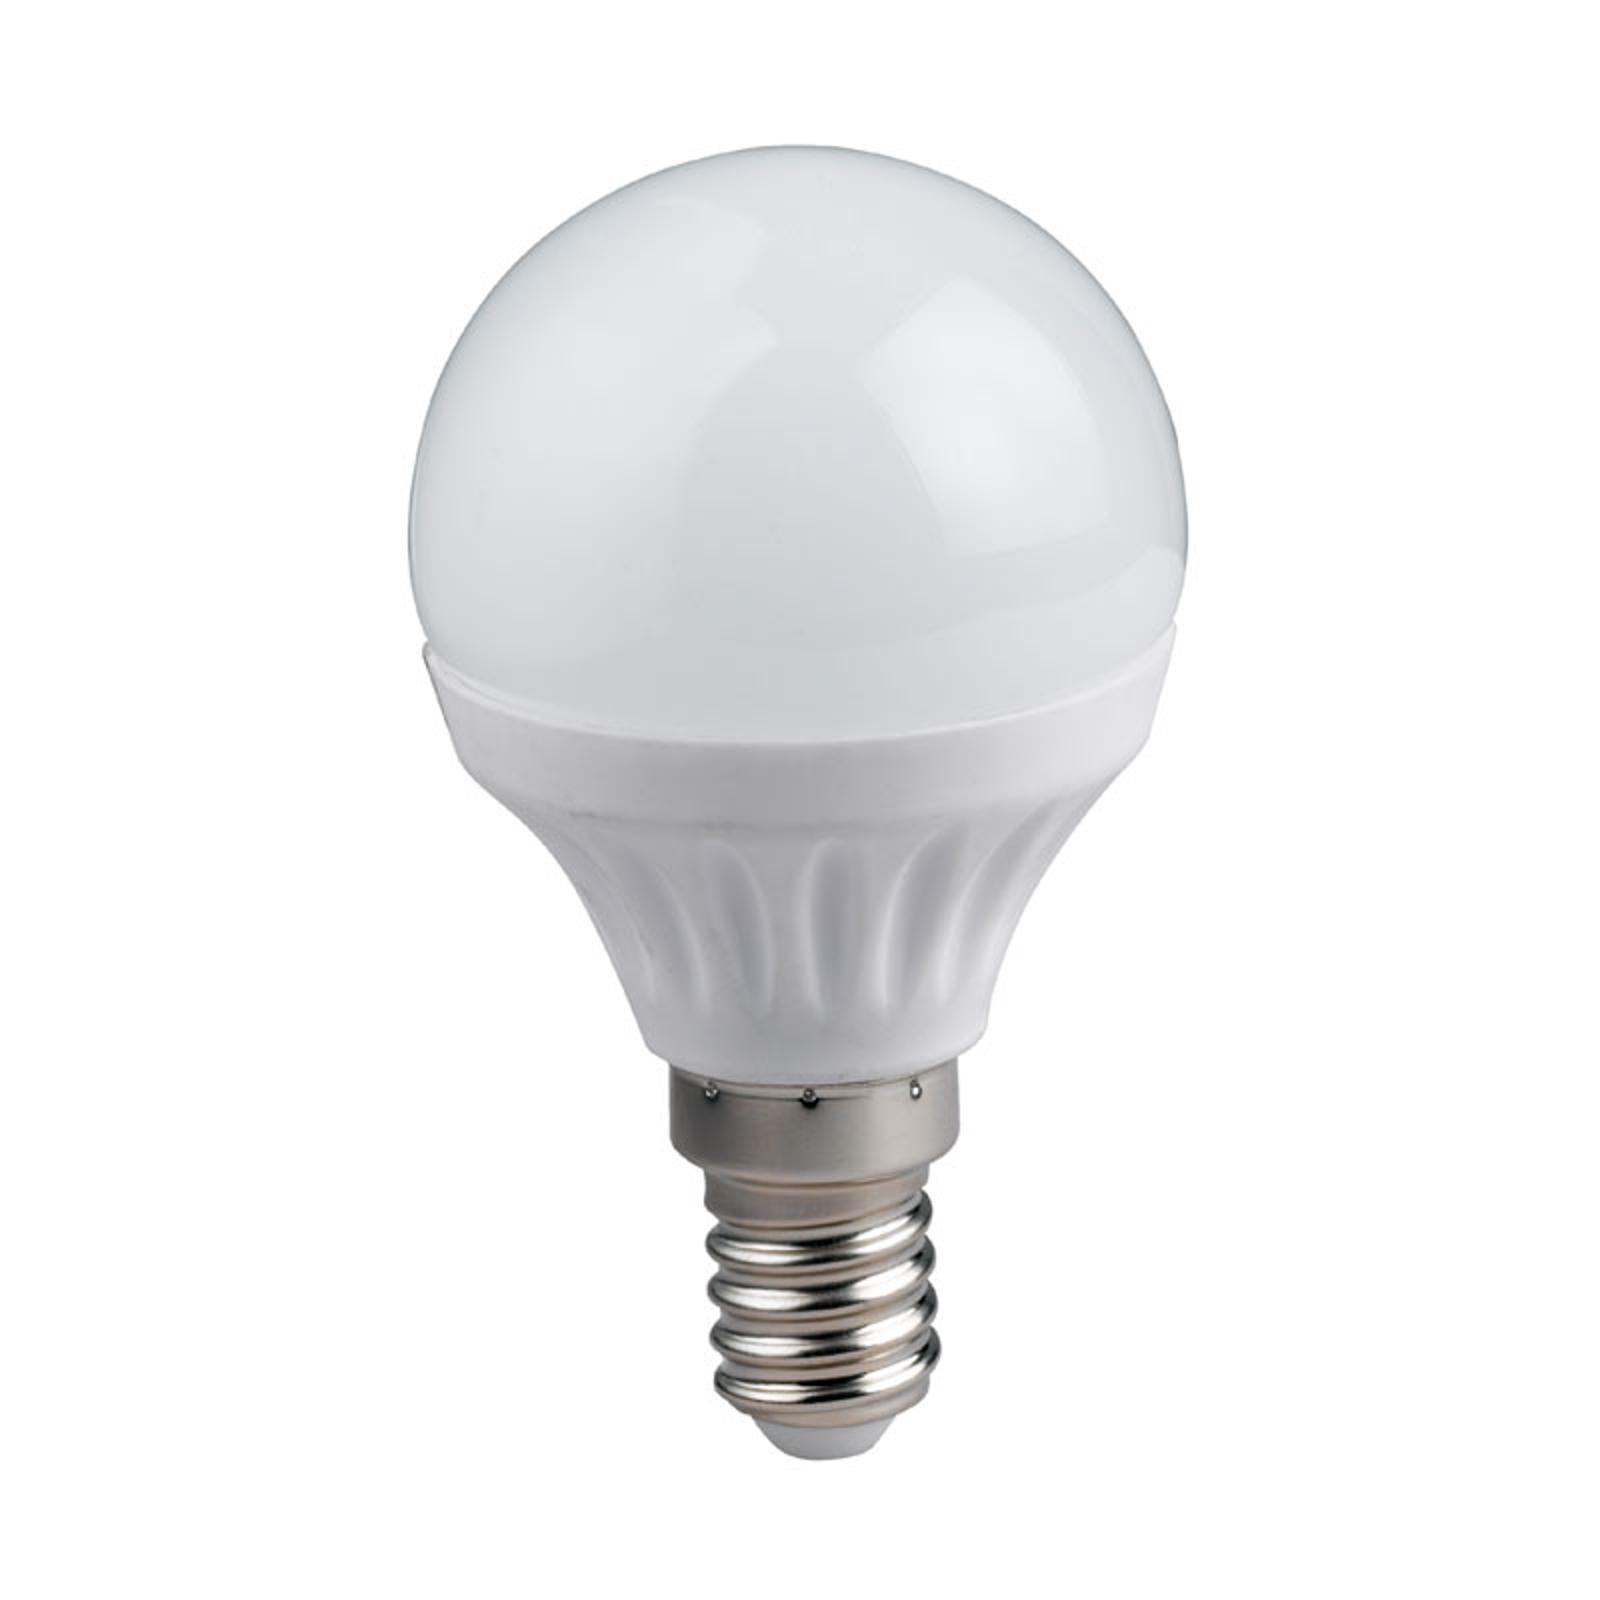 E14 4W LED Tropfenlampe, warmweiß